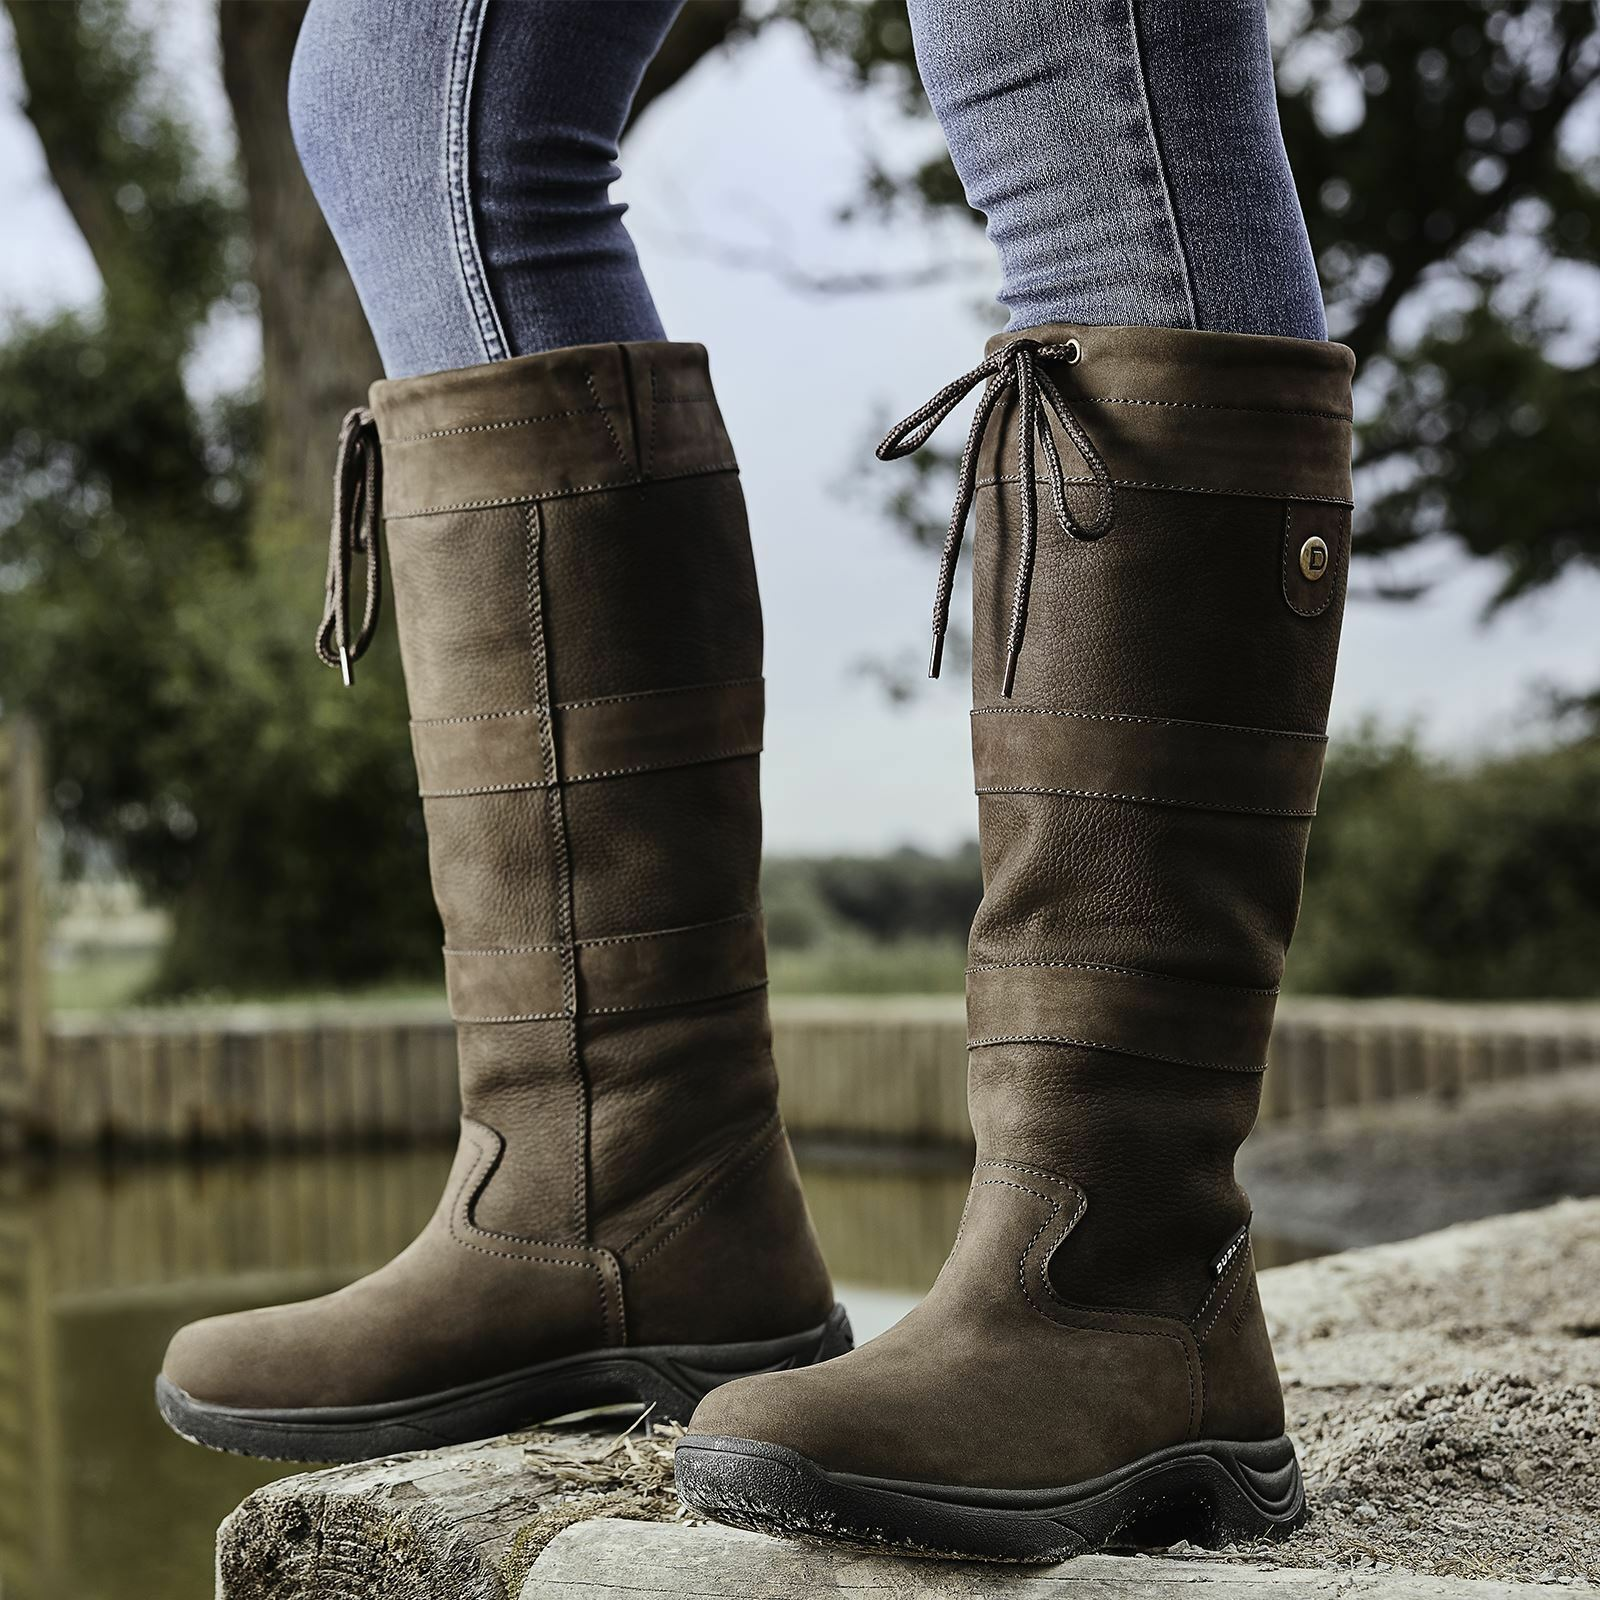 Nuevas damas damas damas de Dublín Río III impermeable perro caminar Equitación botas De País a02ca7